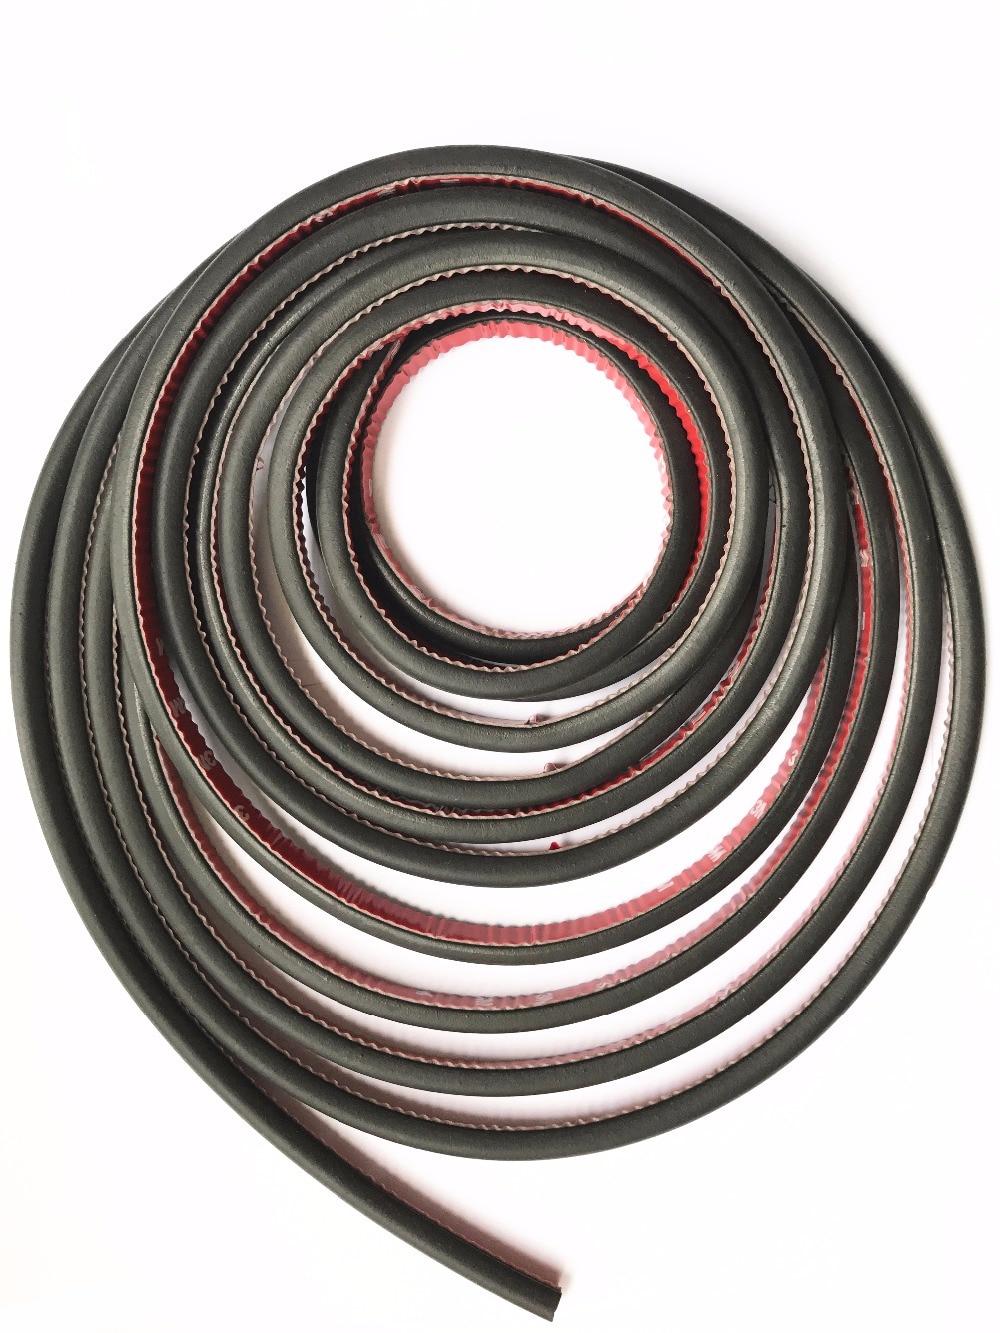 Plano D Forma Hollow Car Rubber Seal Strip Burlete Auto adherencia - Accesorios de interior de coche - foto 3